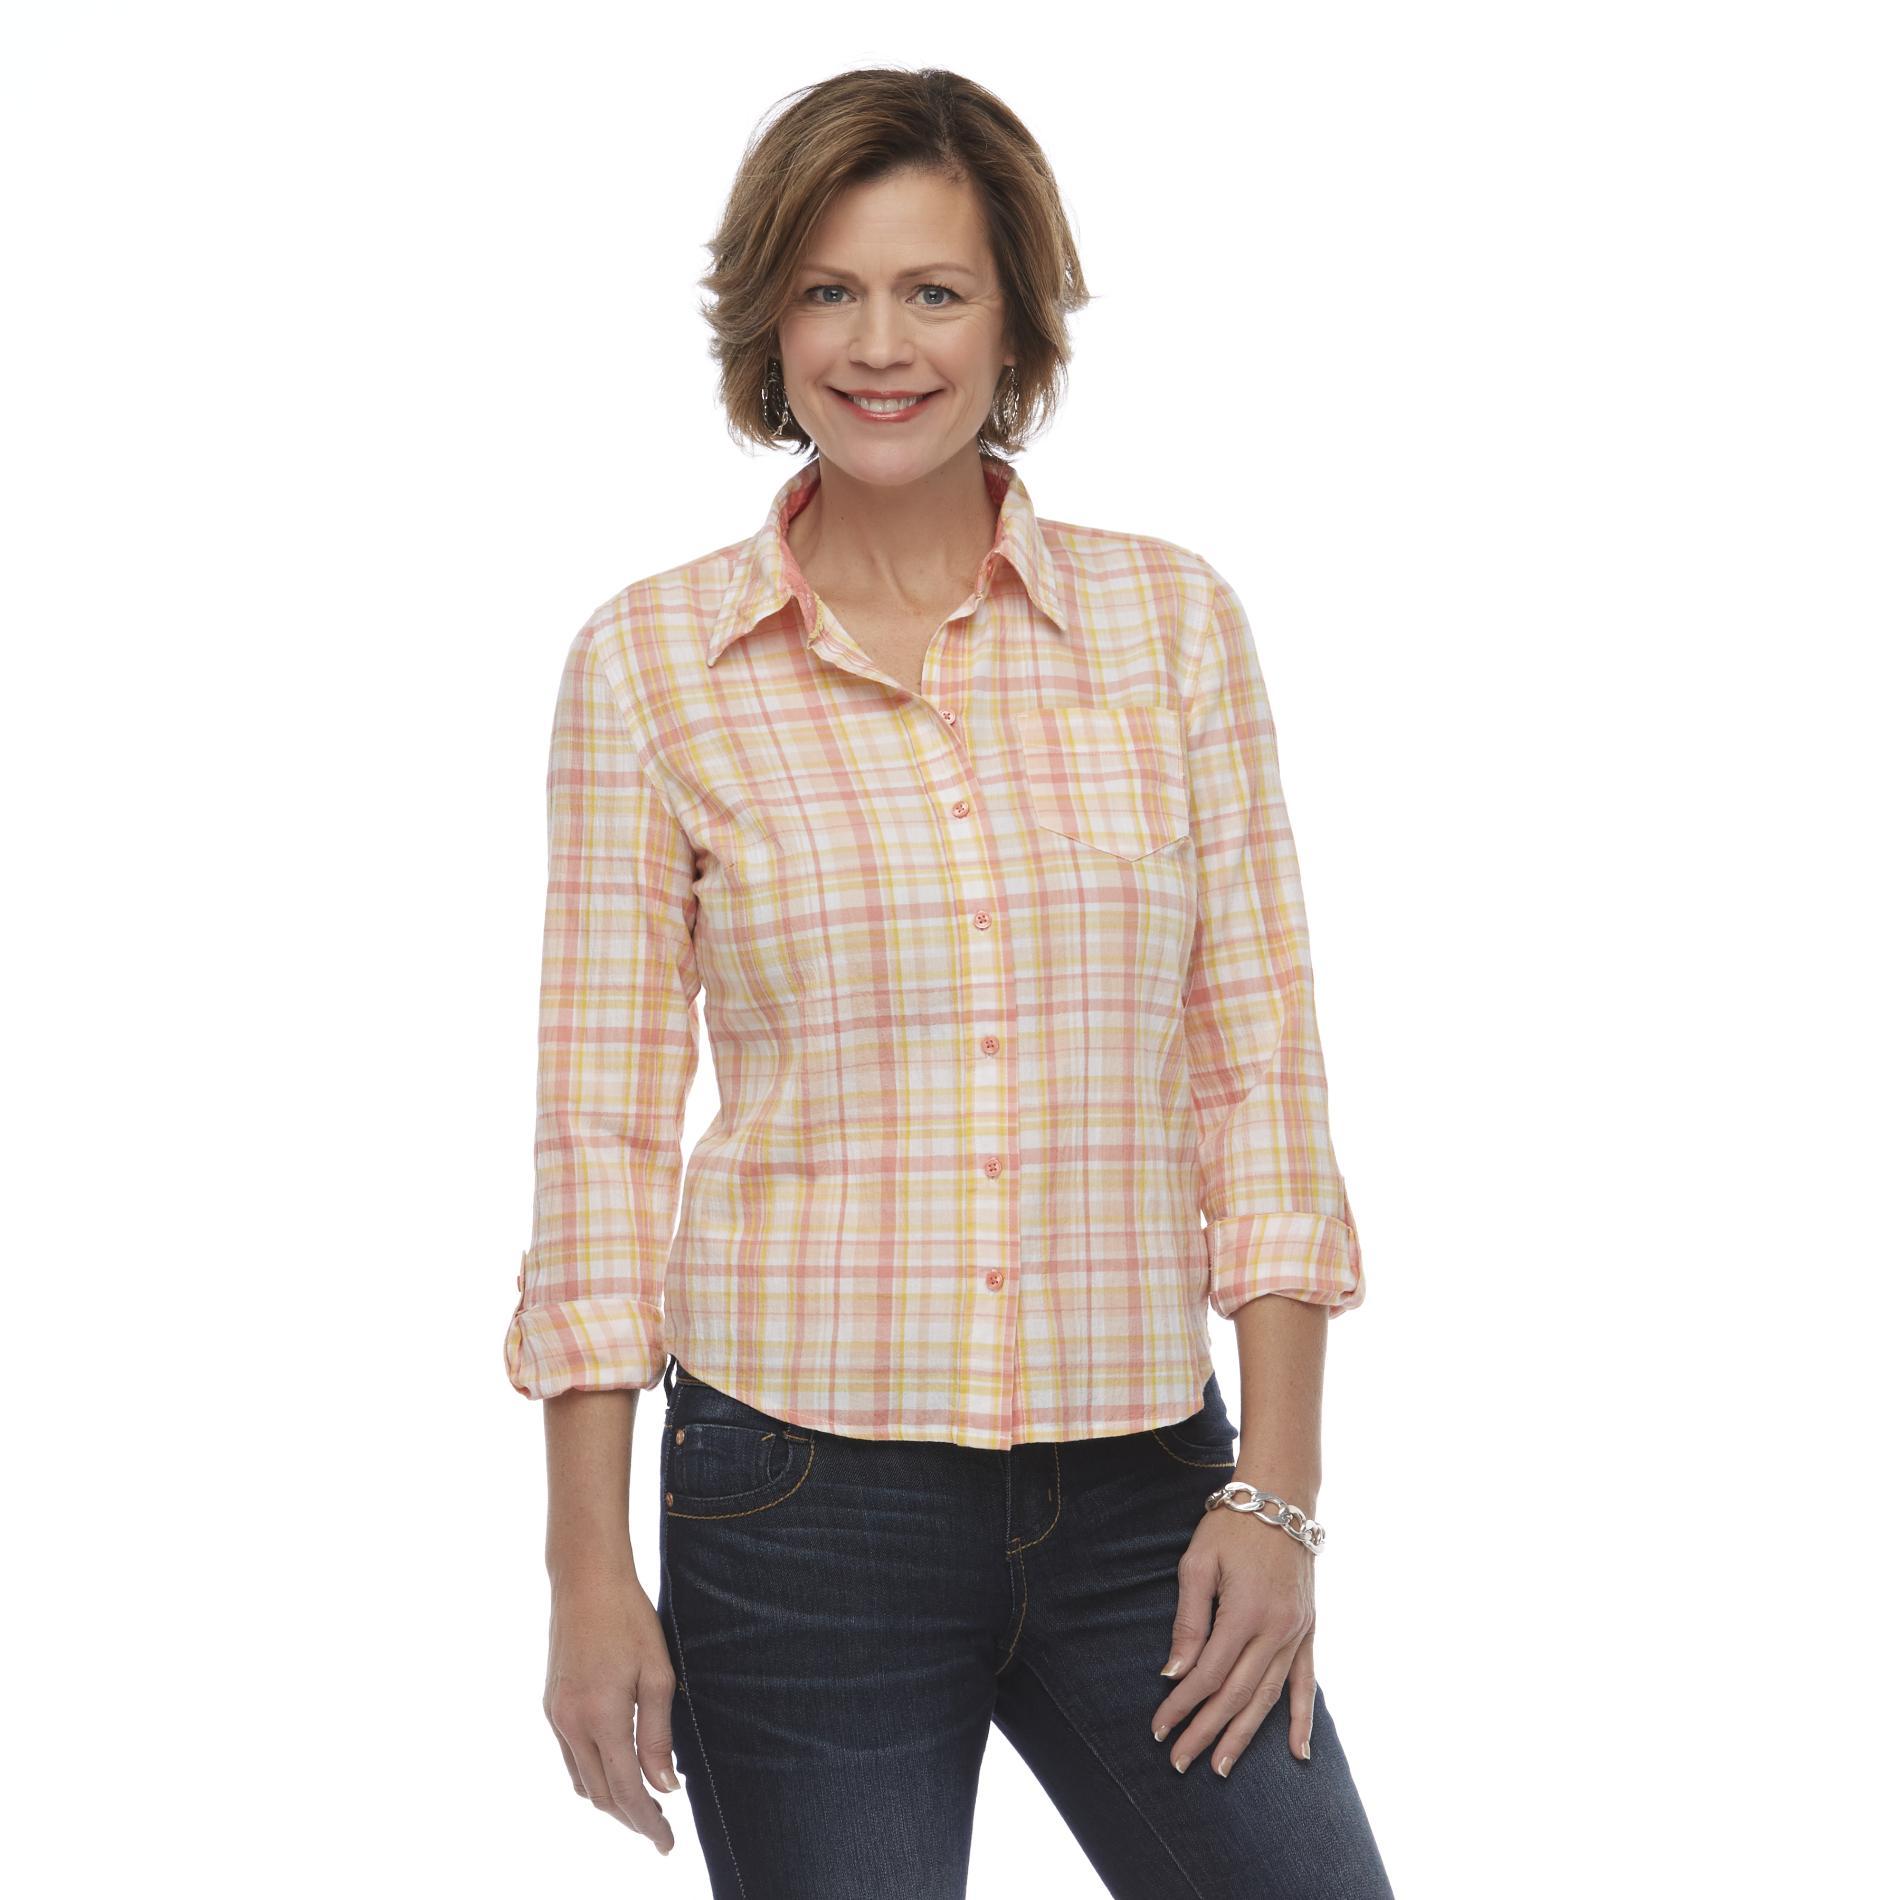 Basic Editions Women's Crepon Shirt - Plaid